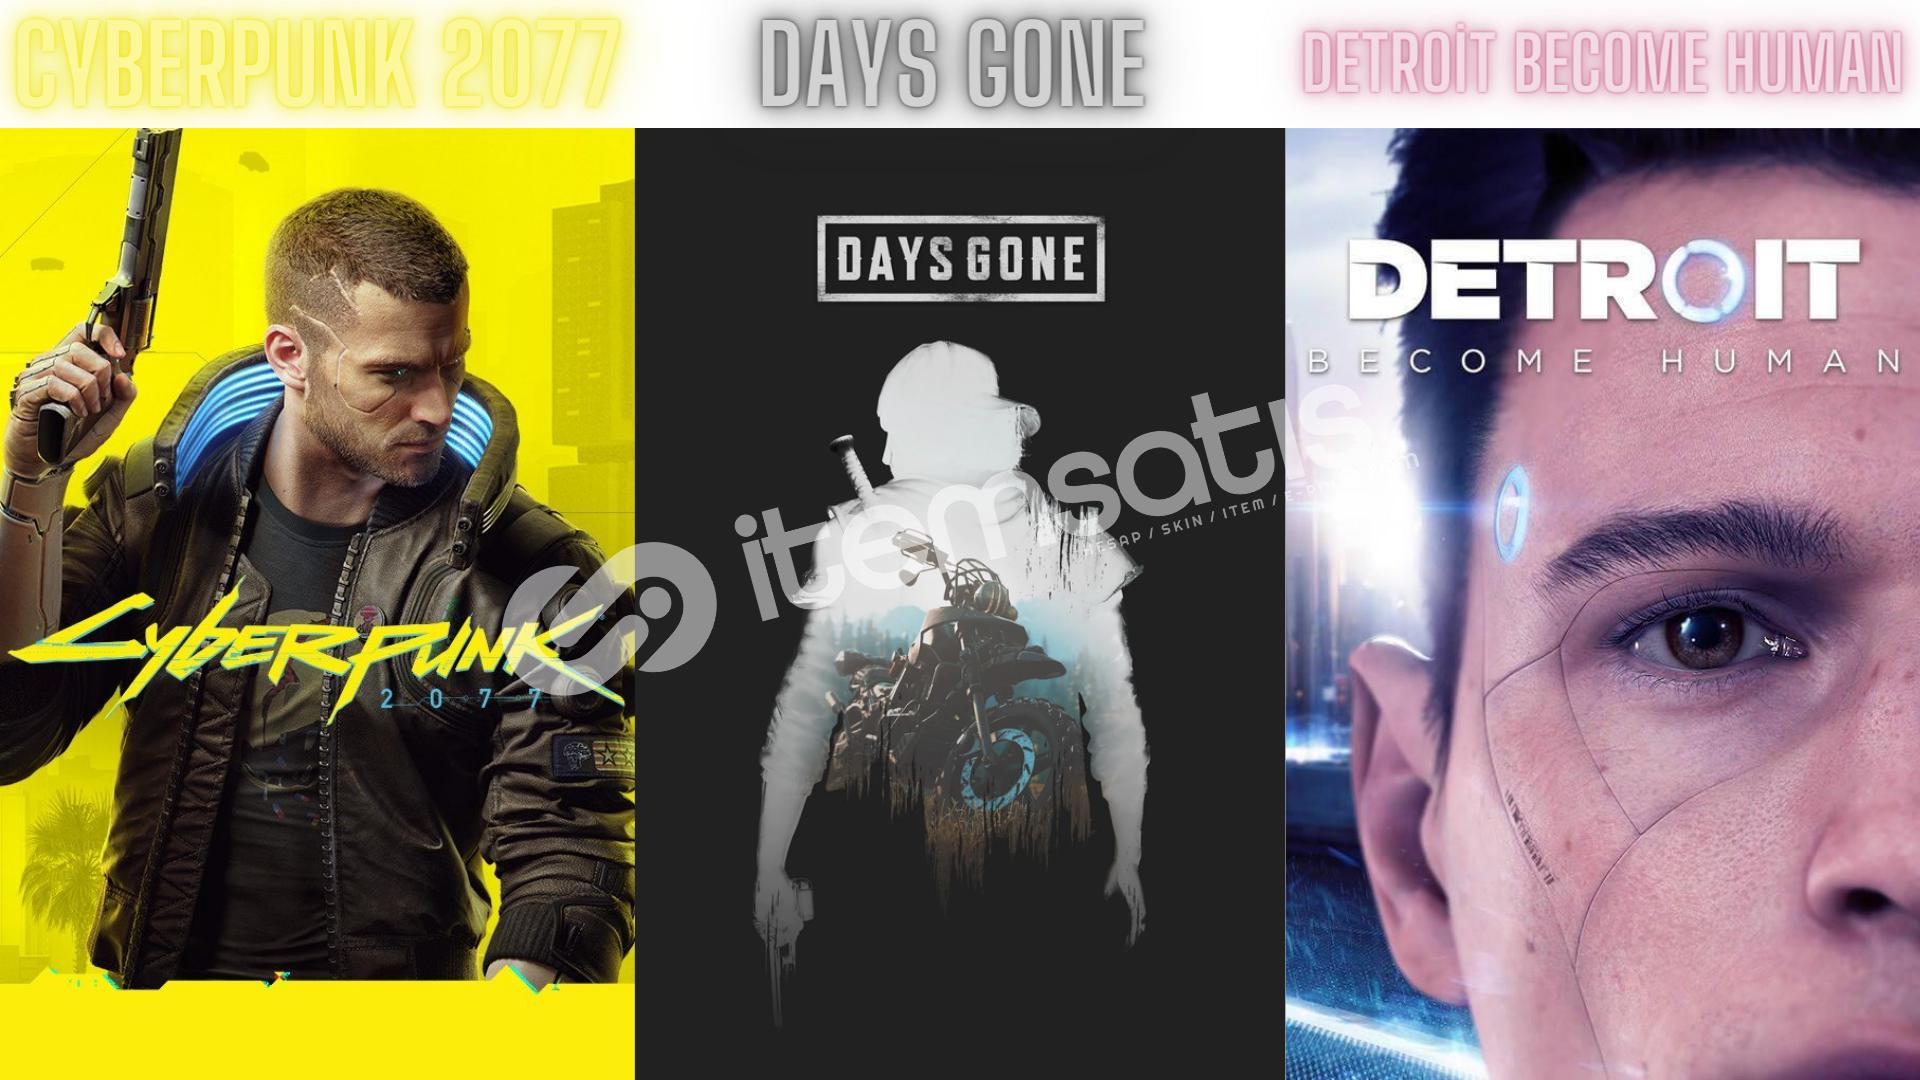 Cyberpunk 2077 + Days Gone + Detroit Become Human + GARANTİ